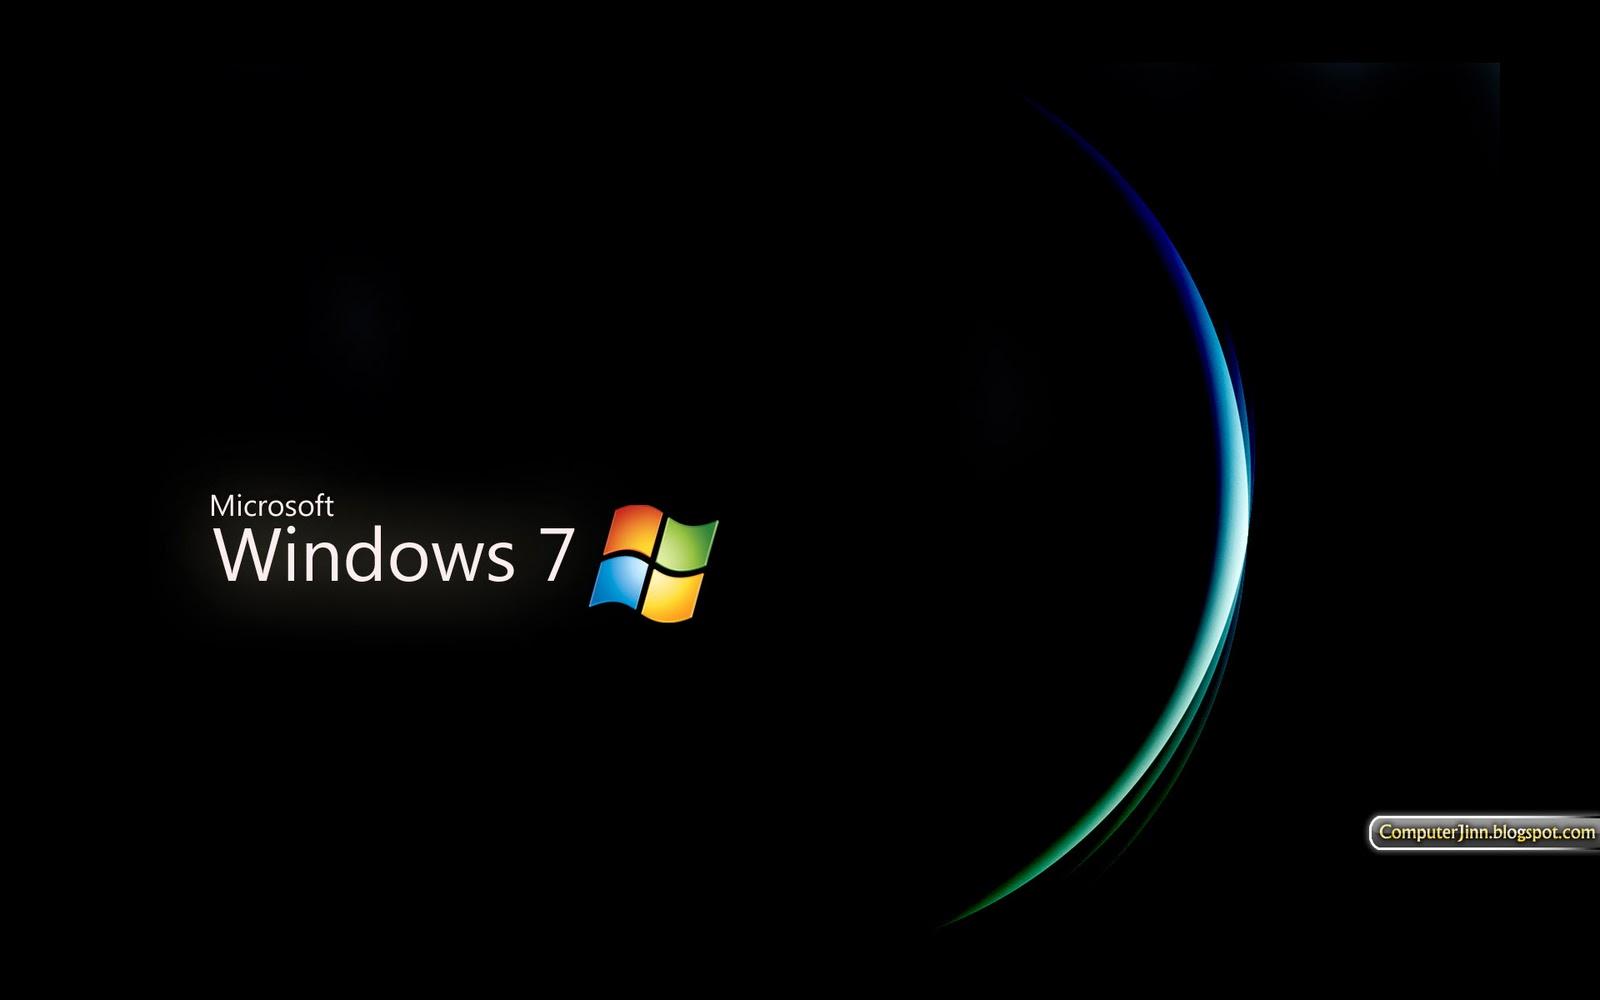 Download windows seven black 1024x768 wallpaper 1771 - Windows 7 Black And Dark Hd Wallpapers Wallpapers Pictures Images